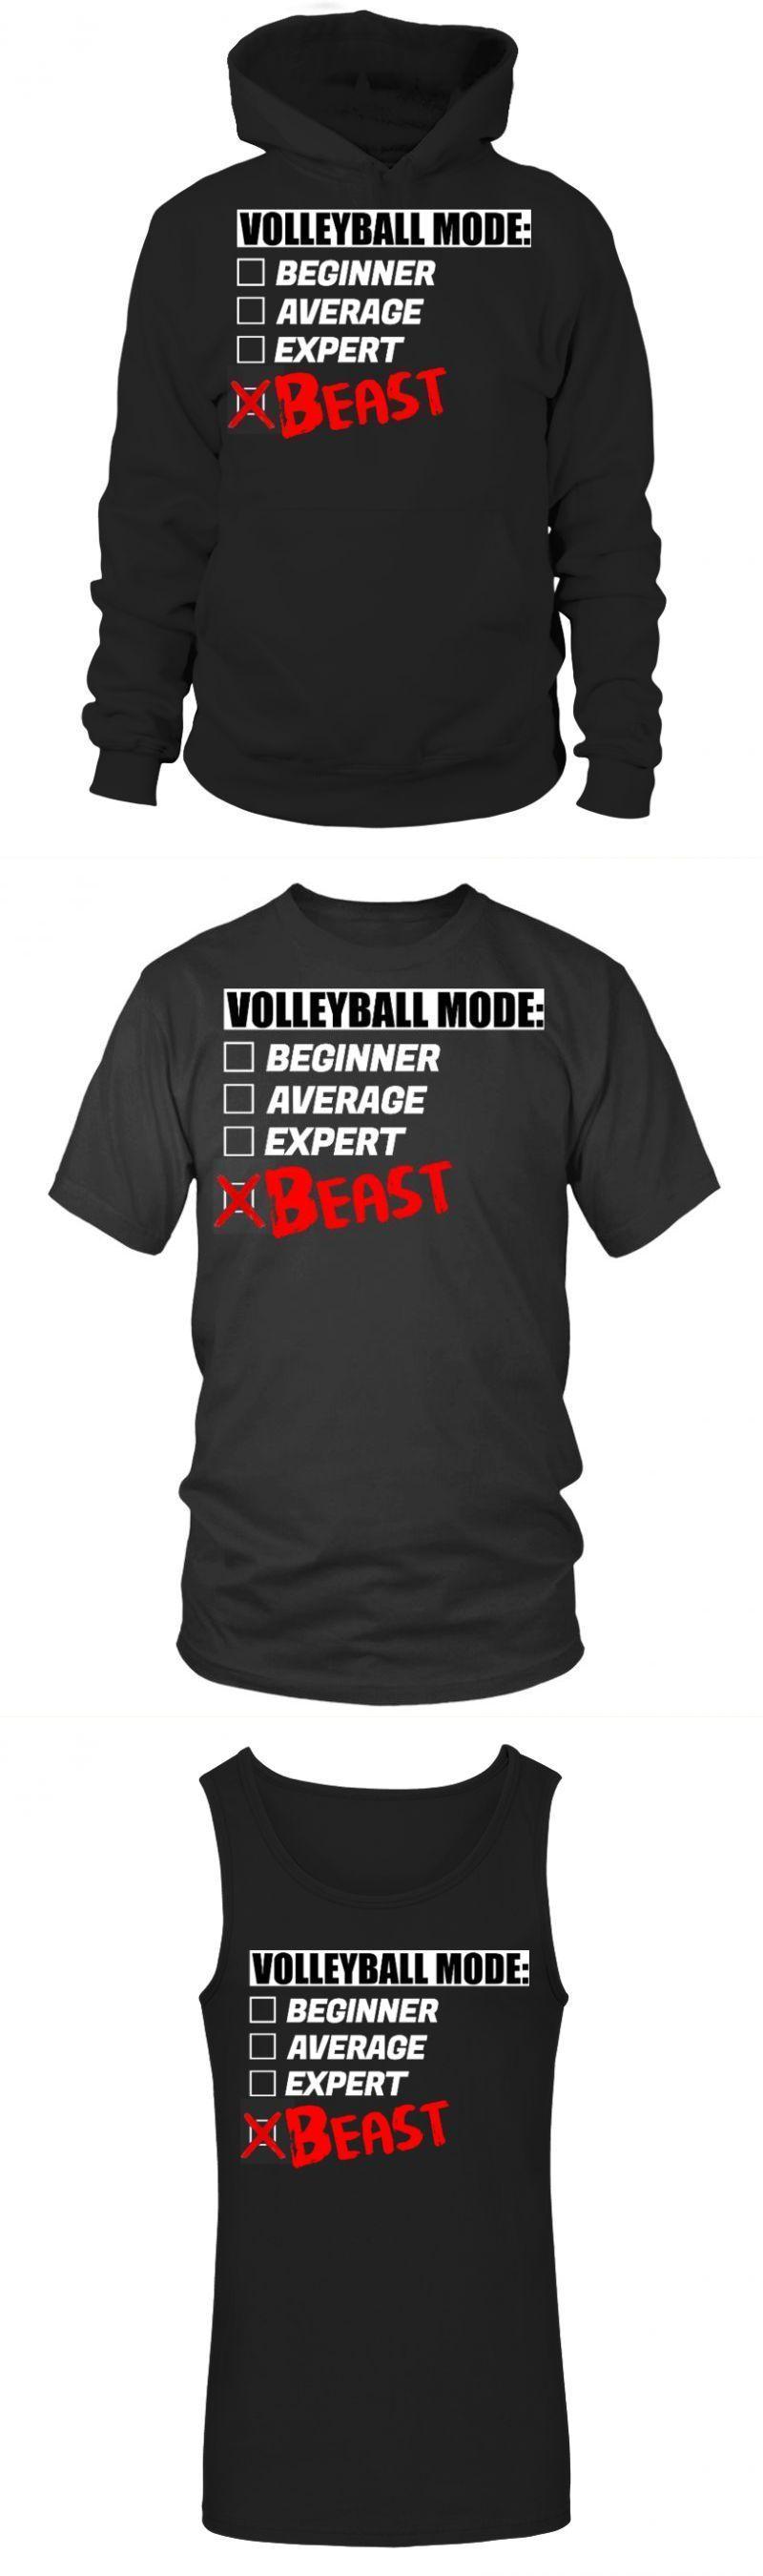 Mizuno T Shirt Volleyball Beast Mode Volleyball T Shirt Printing Mizuno T Shirt Volleyball Beast Mode Shir Printed Shirts Volleyball Tshirts Tshirt Print